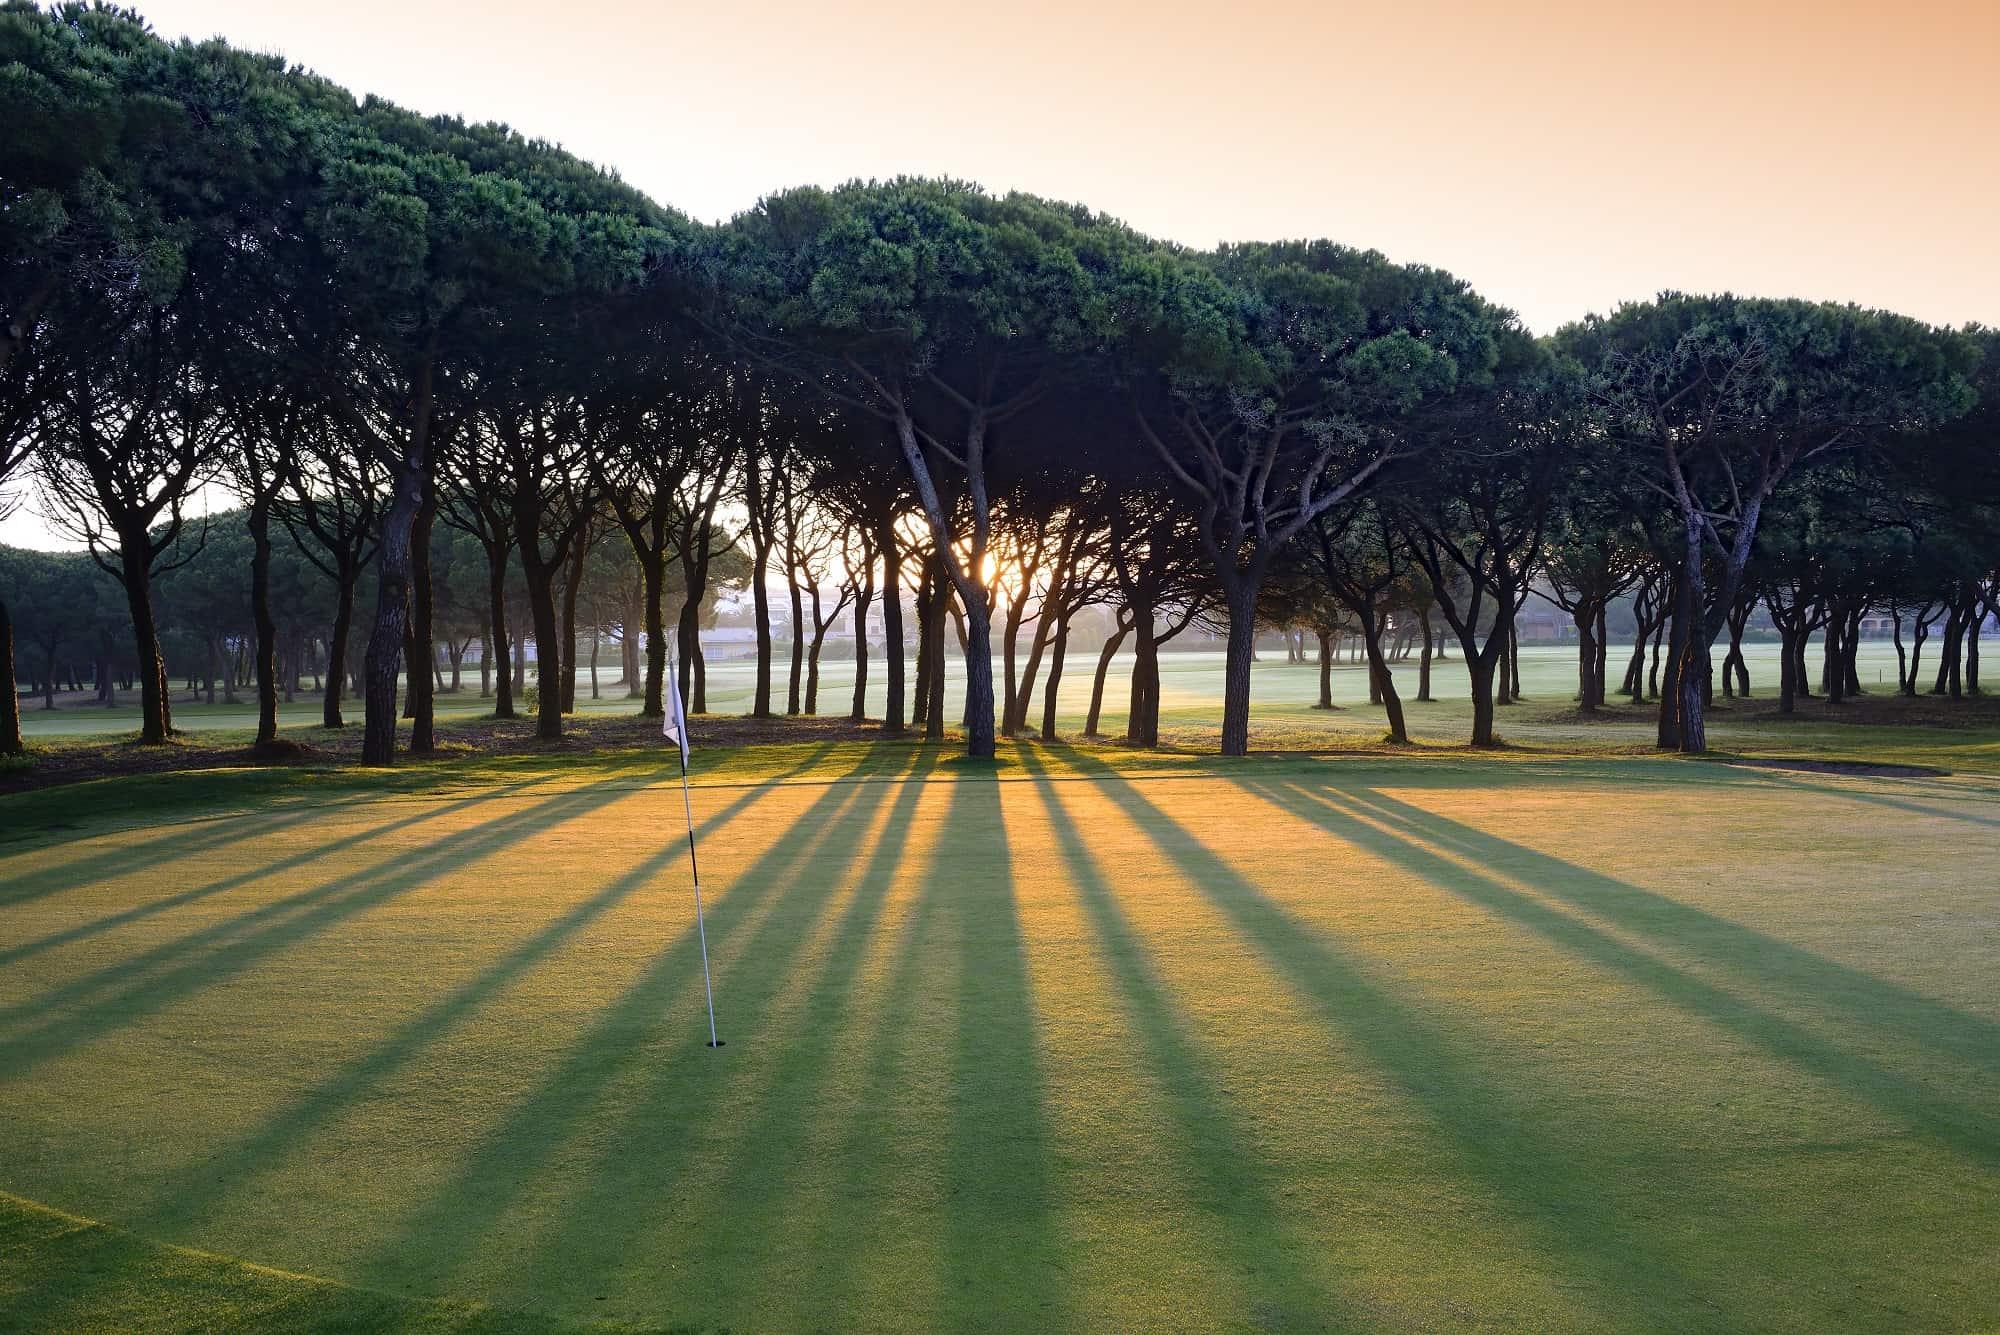 activitats/golf/gpp_7_early_2000pxls.jpg